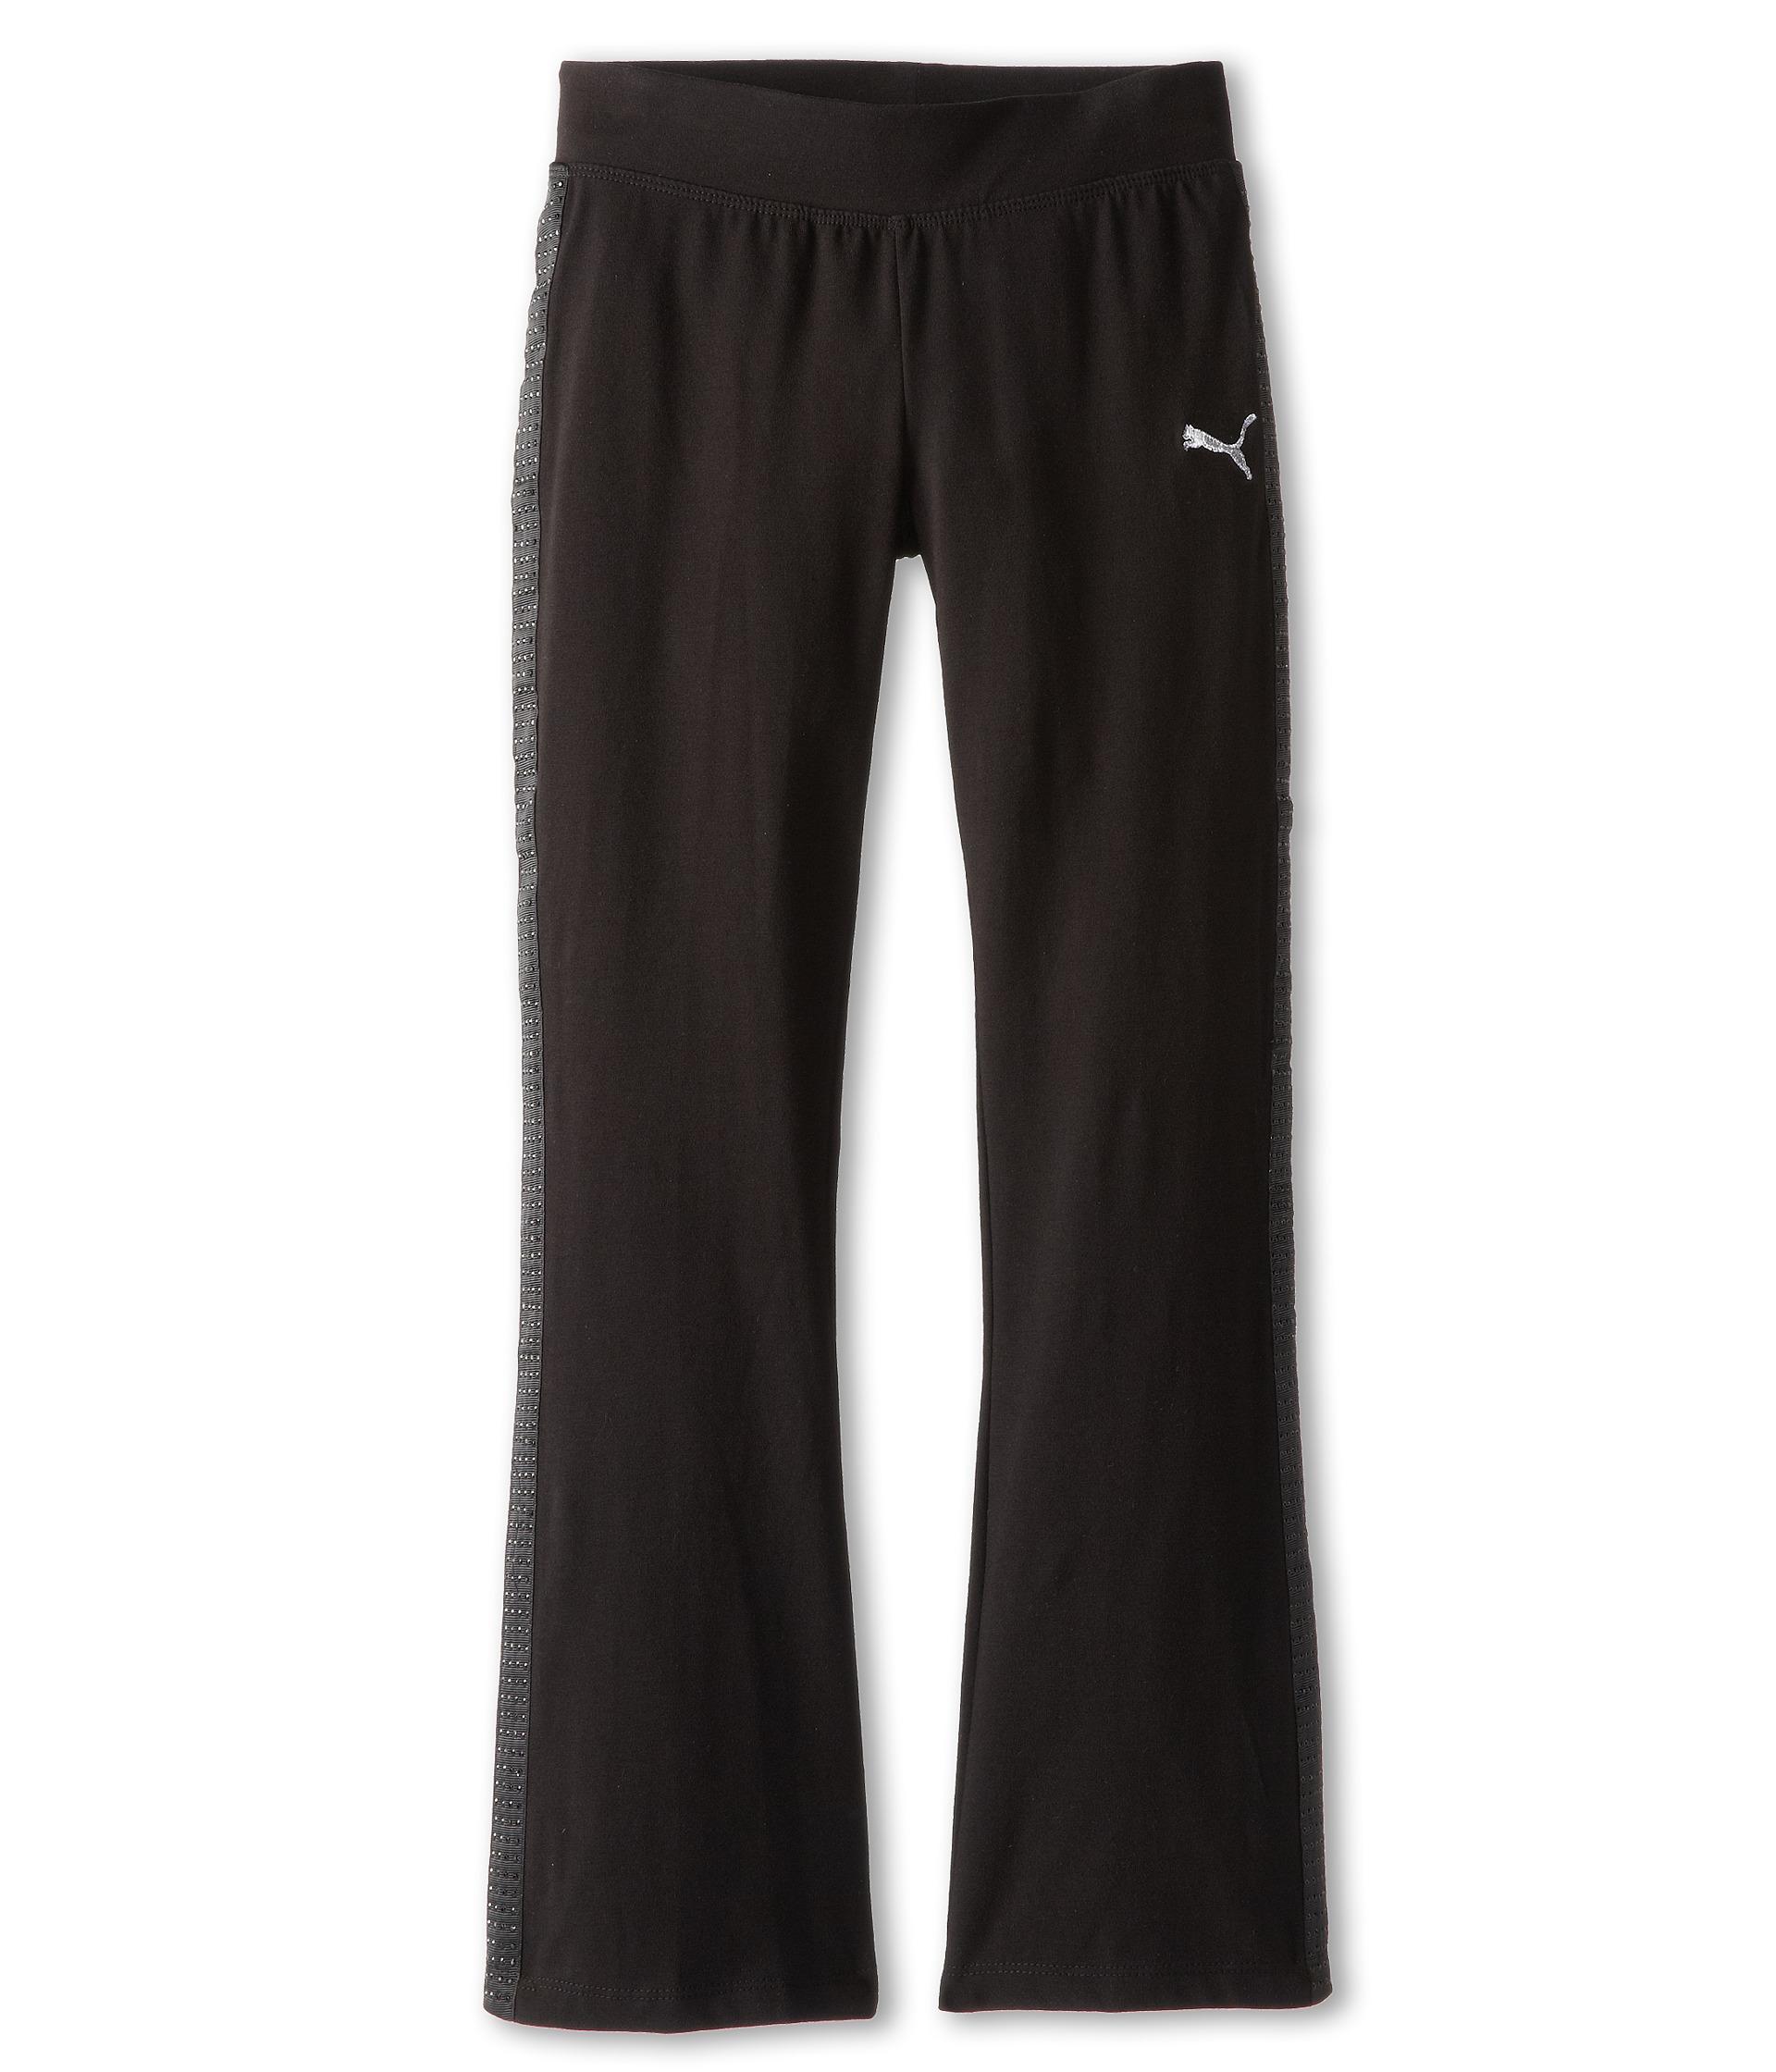 375909d499 Puma Kids Studded Tuxedo Yoga Pant Big Kids   Shipped Free at Zappos